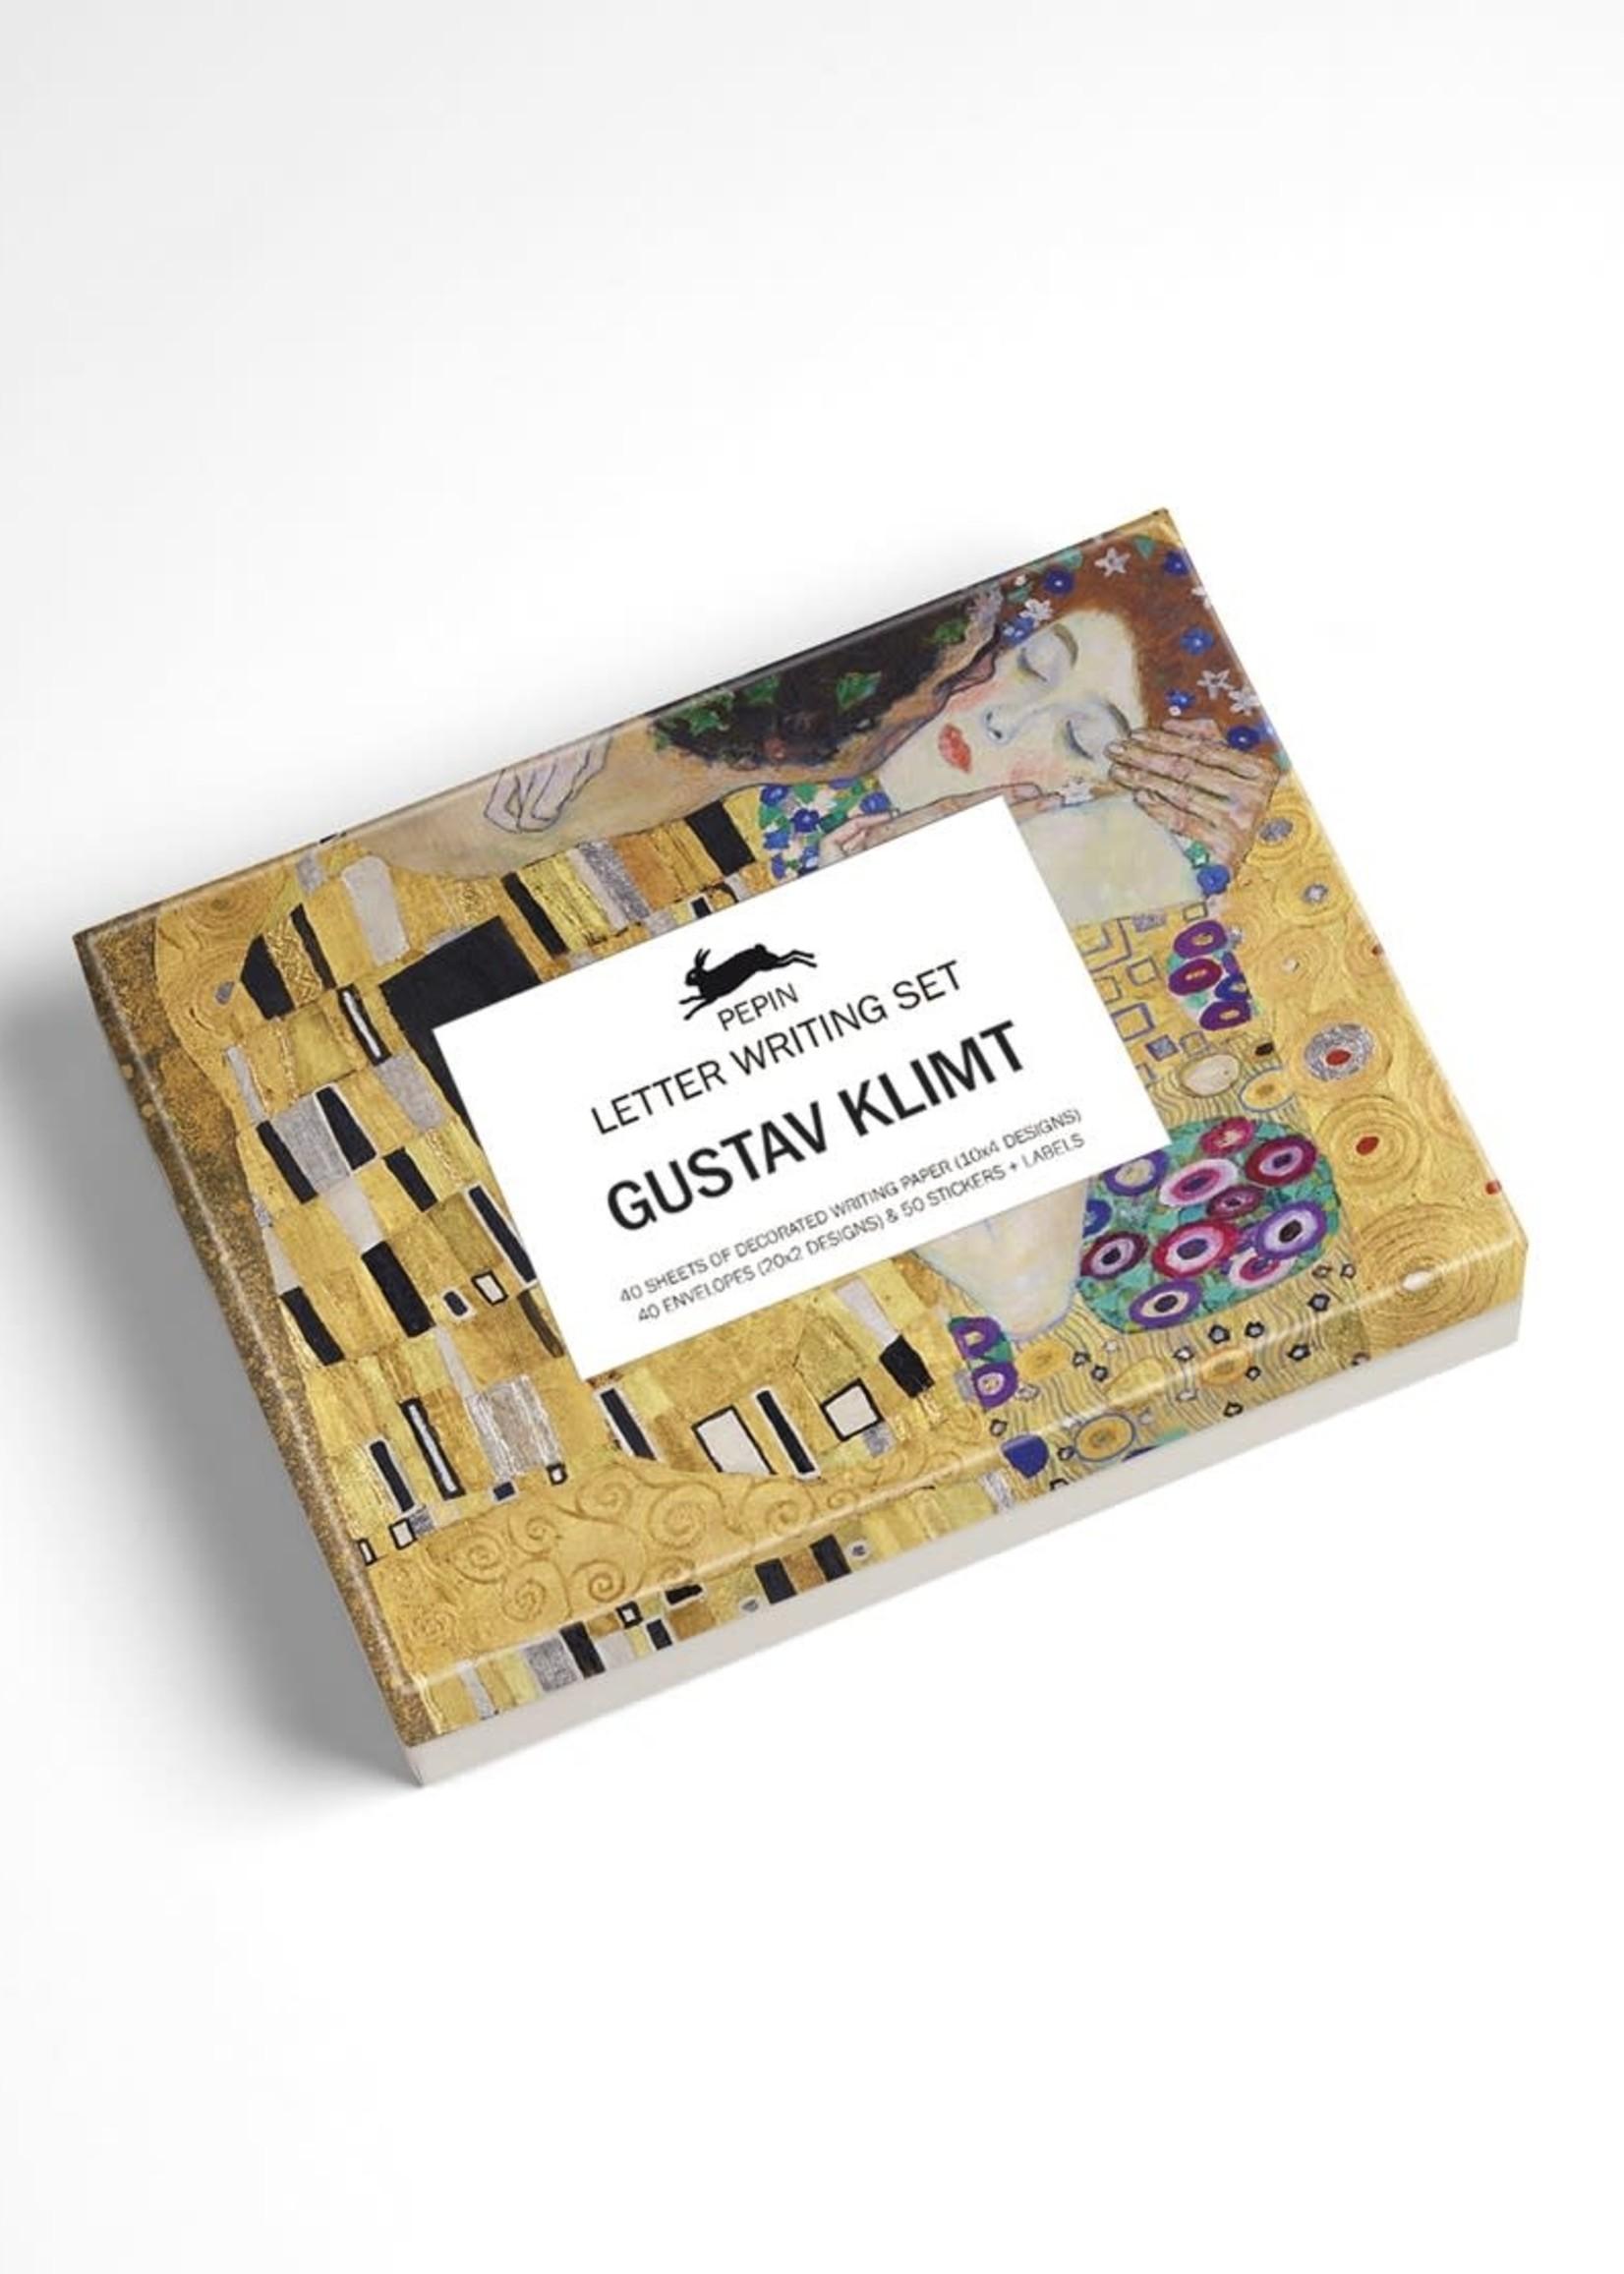 Pepin Press Schrijfset briefpapier en enveloppen GUSTAV KLIMT